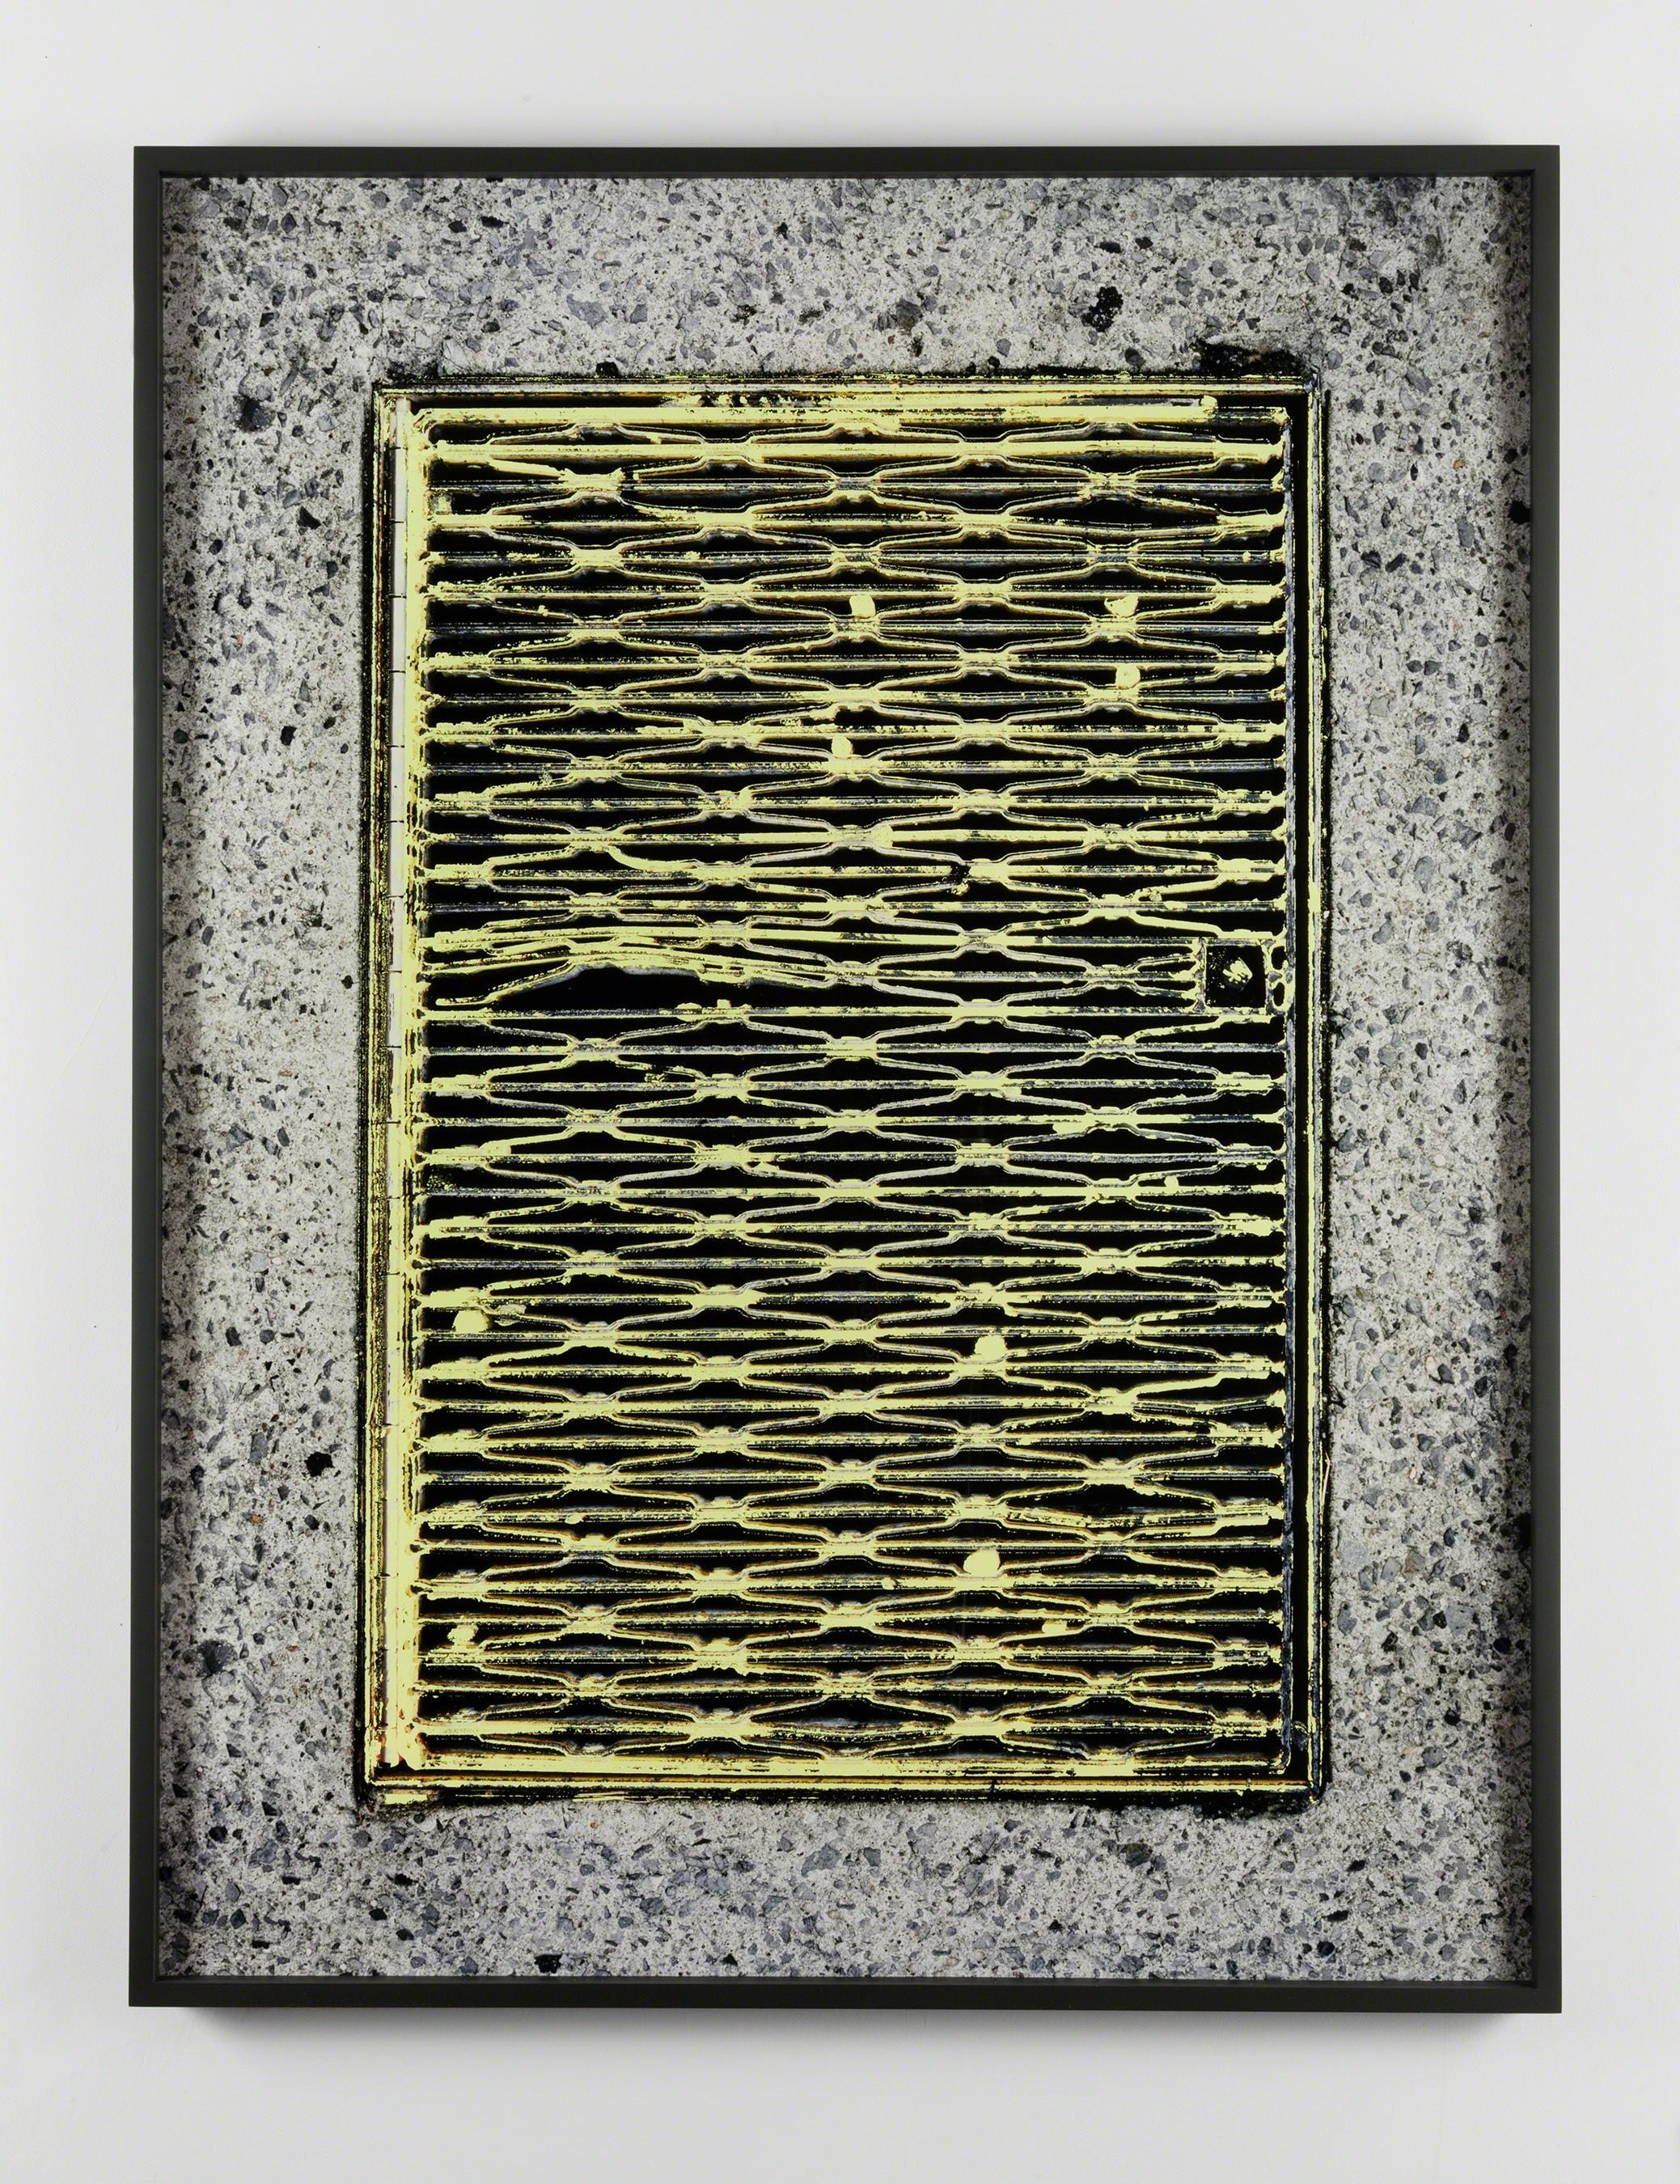 , 'Yellow Grate,' 2014, Altman Siegel